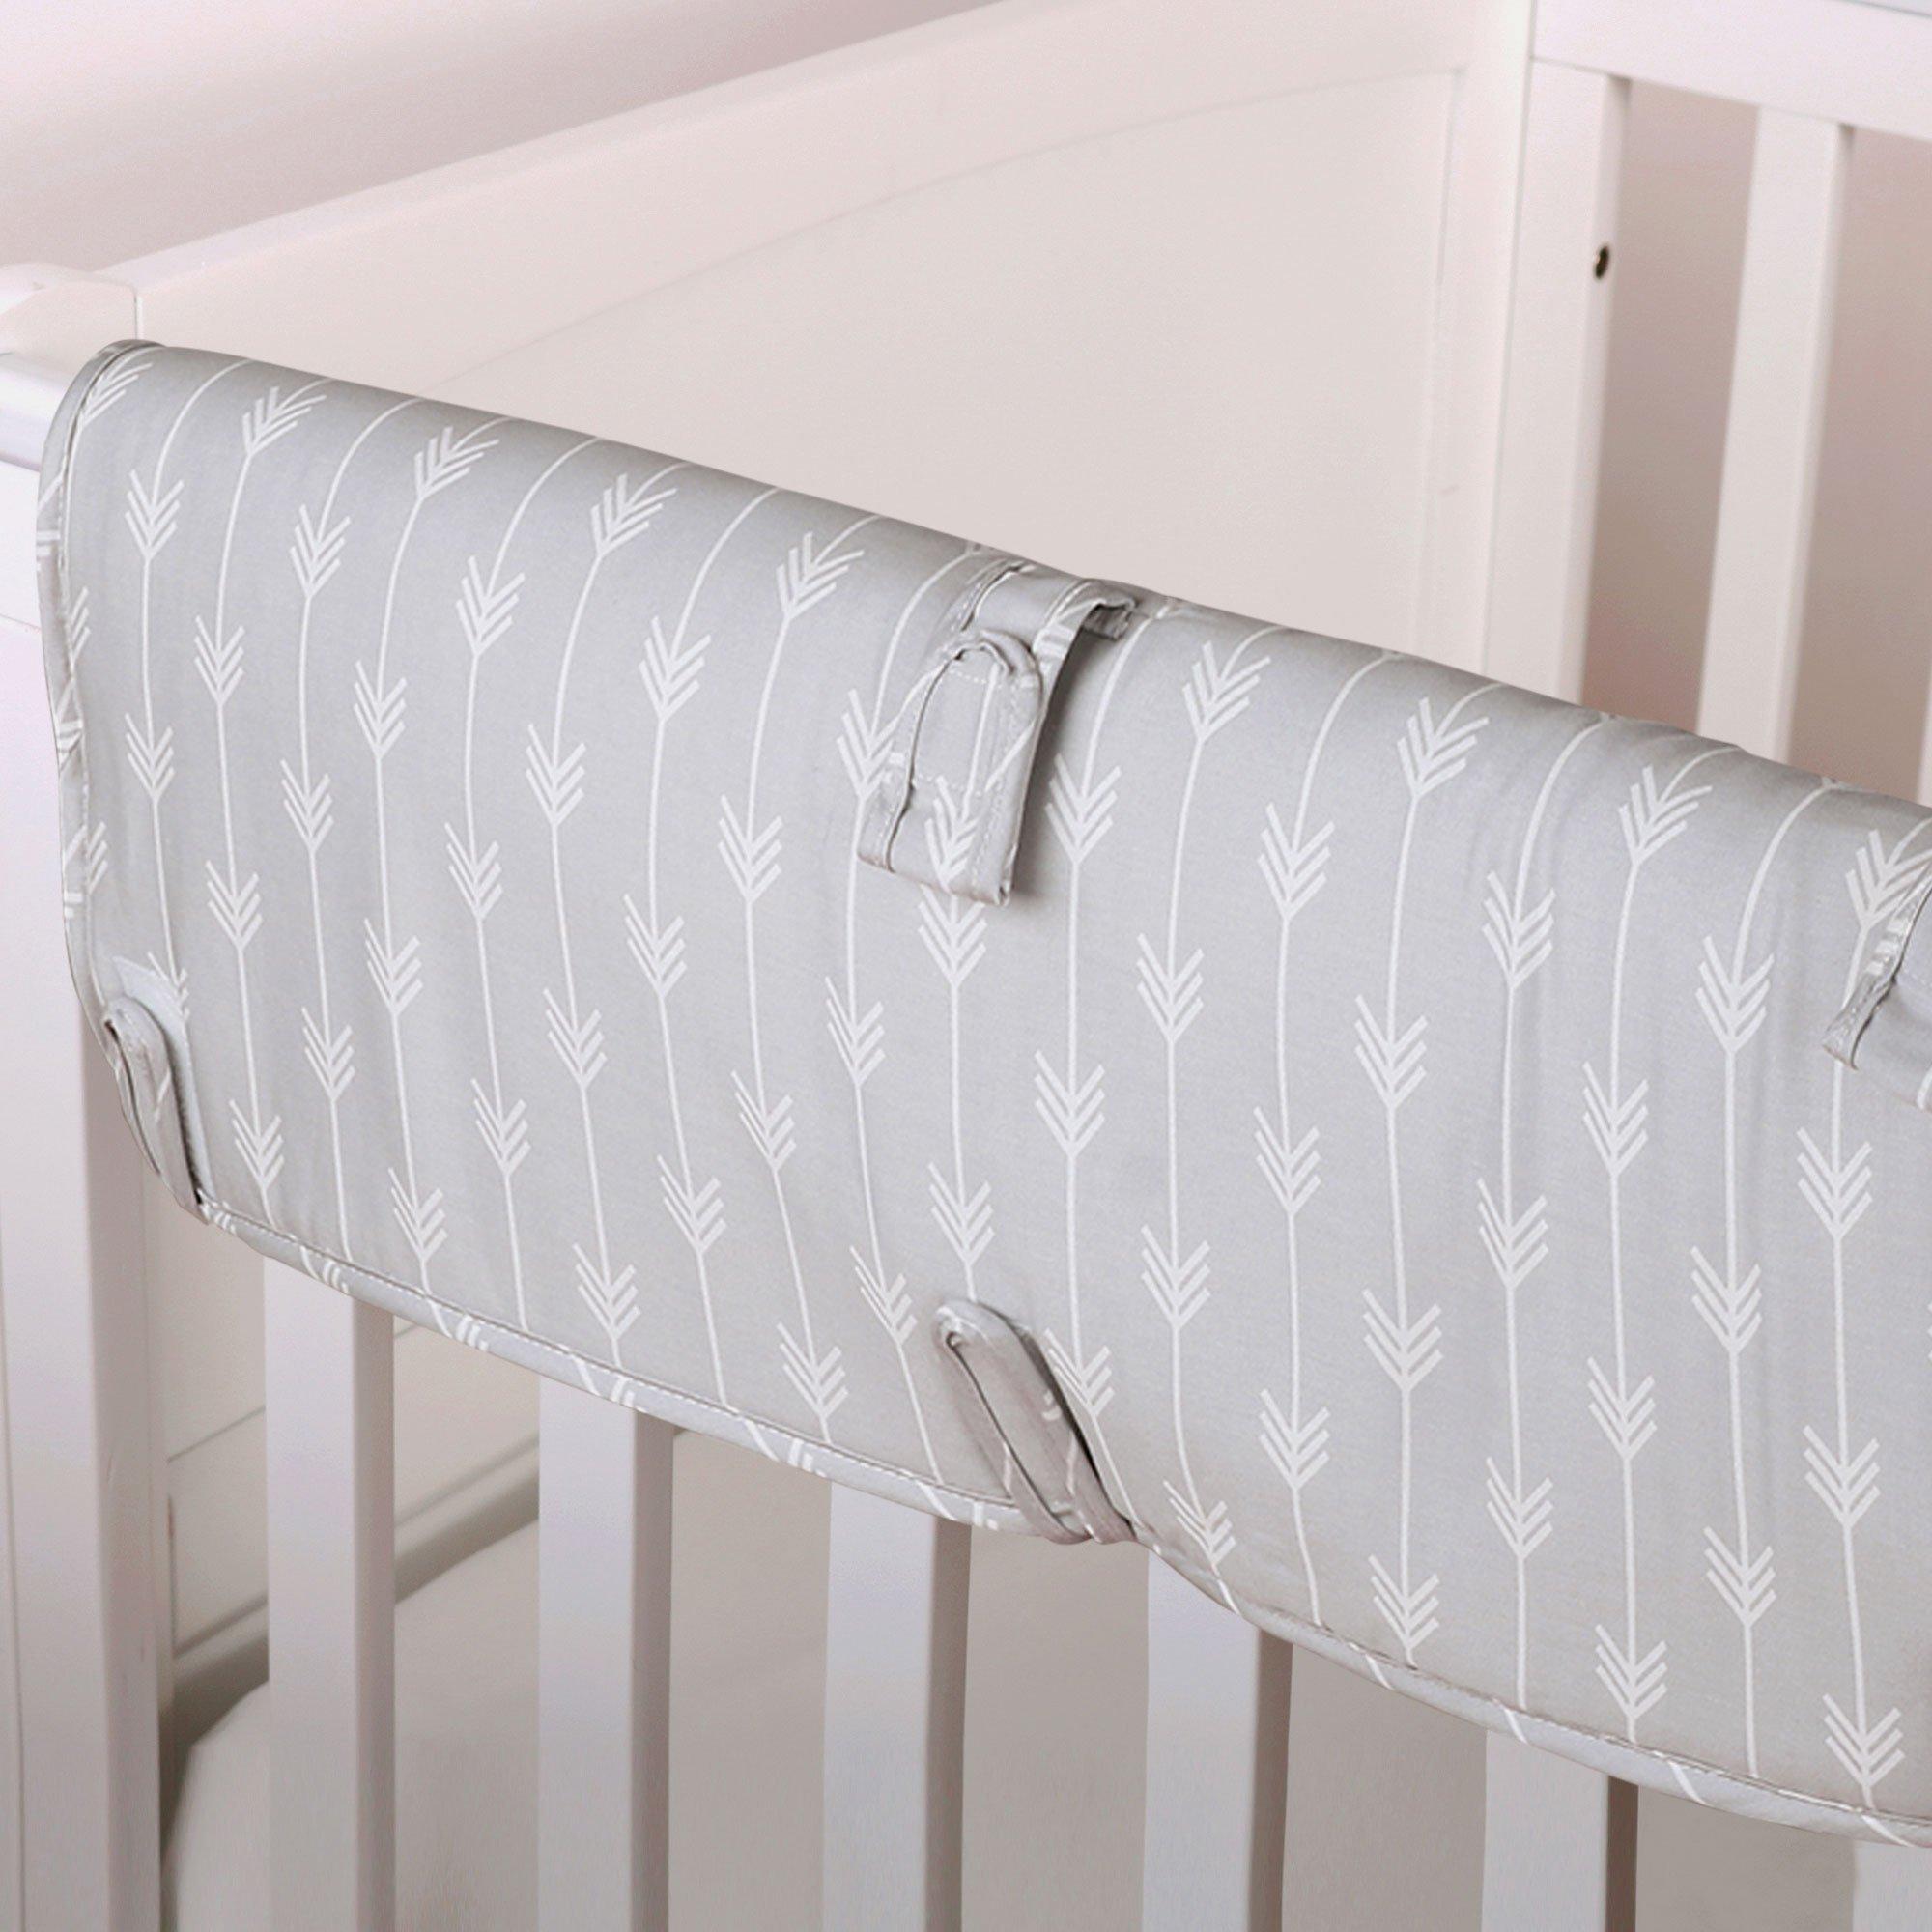 Grey Arrow Print 100% Cotton Padded Crib Rail Guard by The Peanut Shell by The Peanut Shell